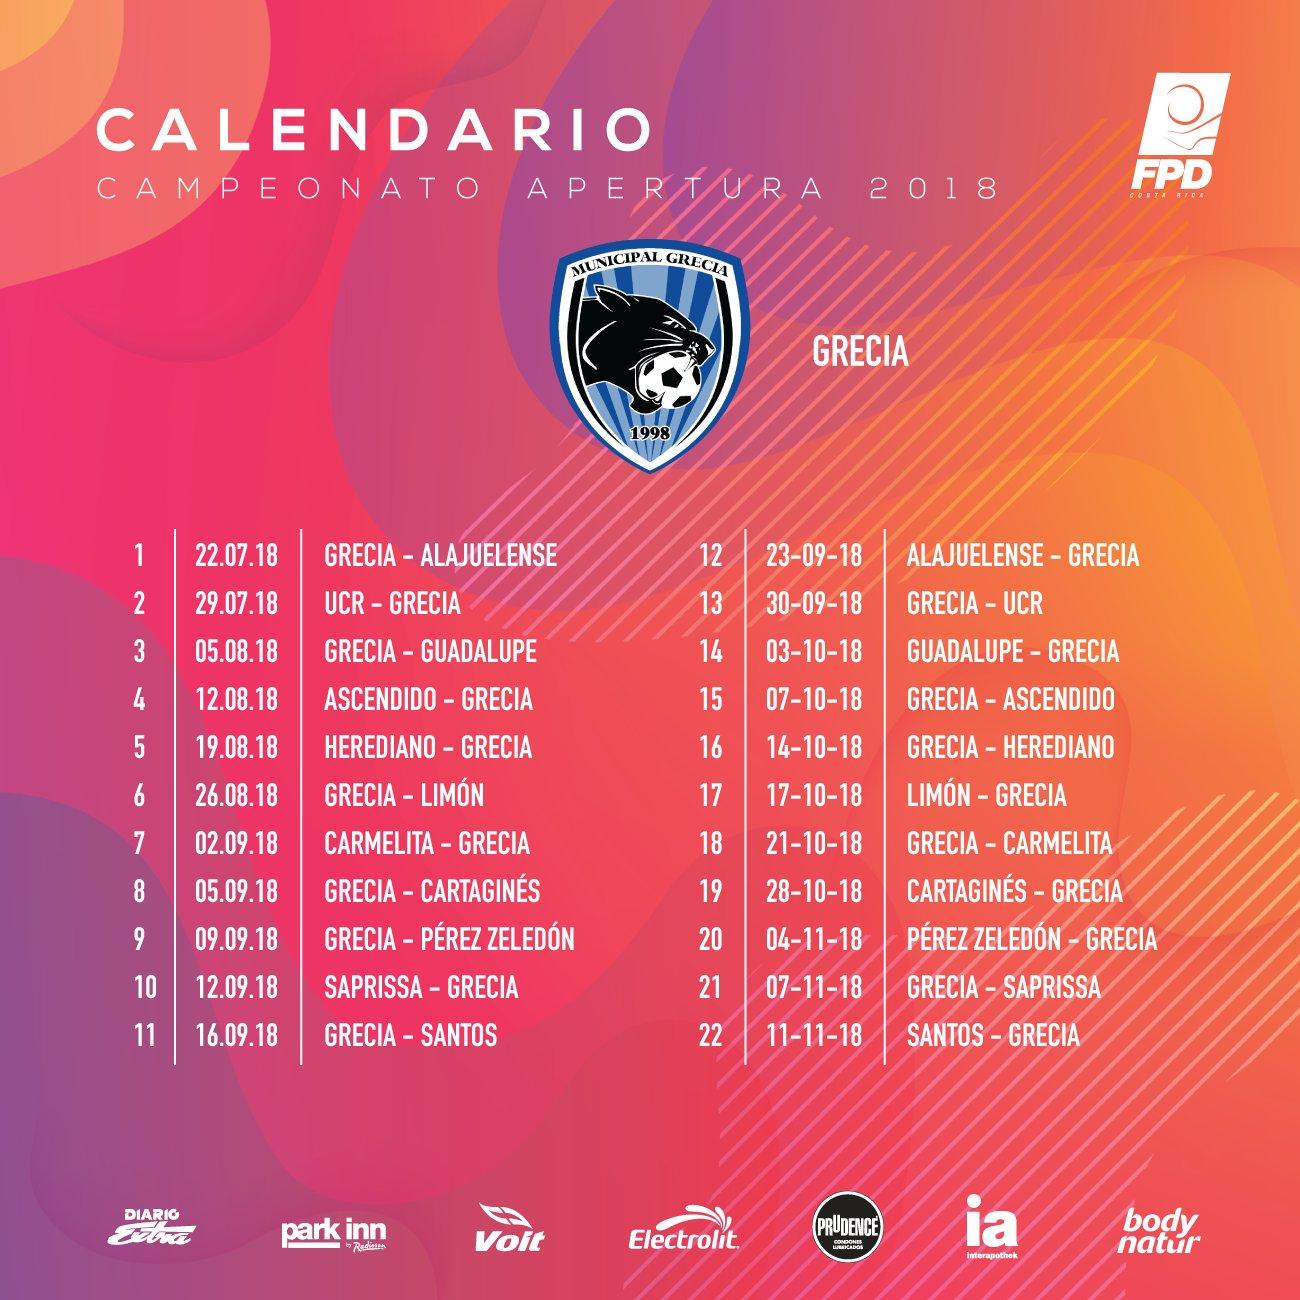 1998 Calendario.Unafut On Twitter Calendario Apertura2018 Municipalgrecia